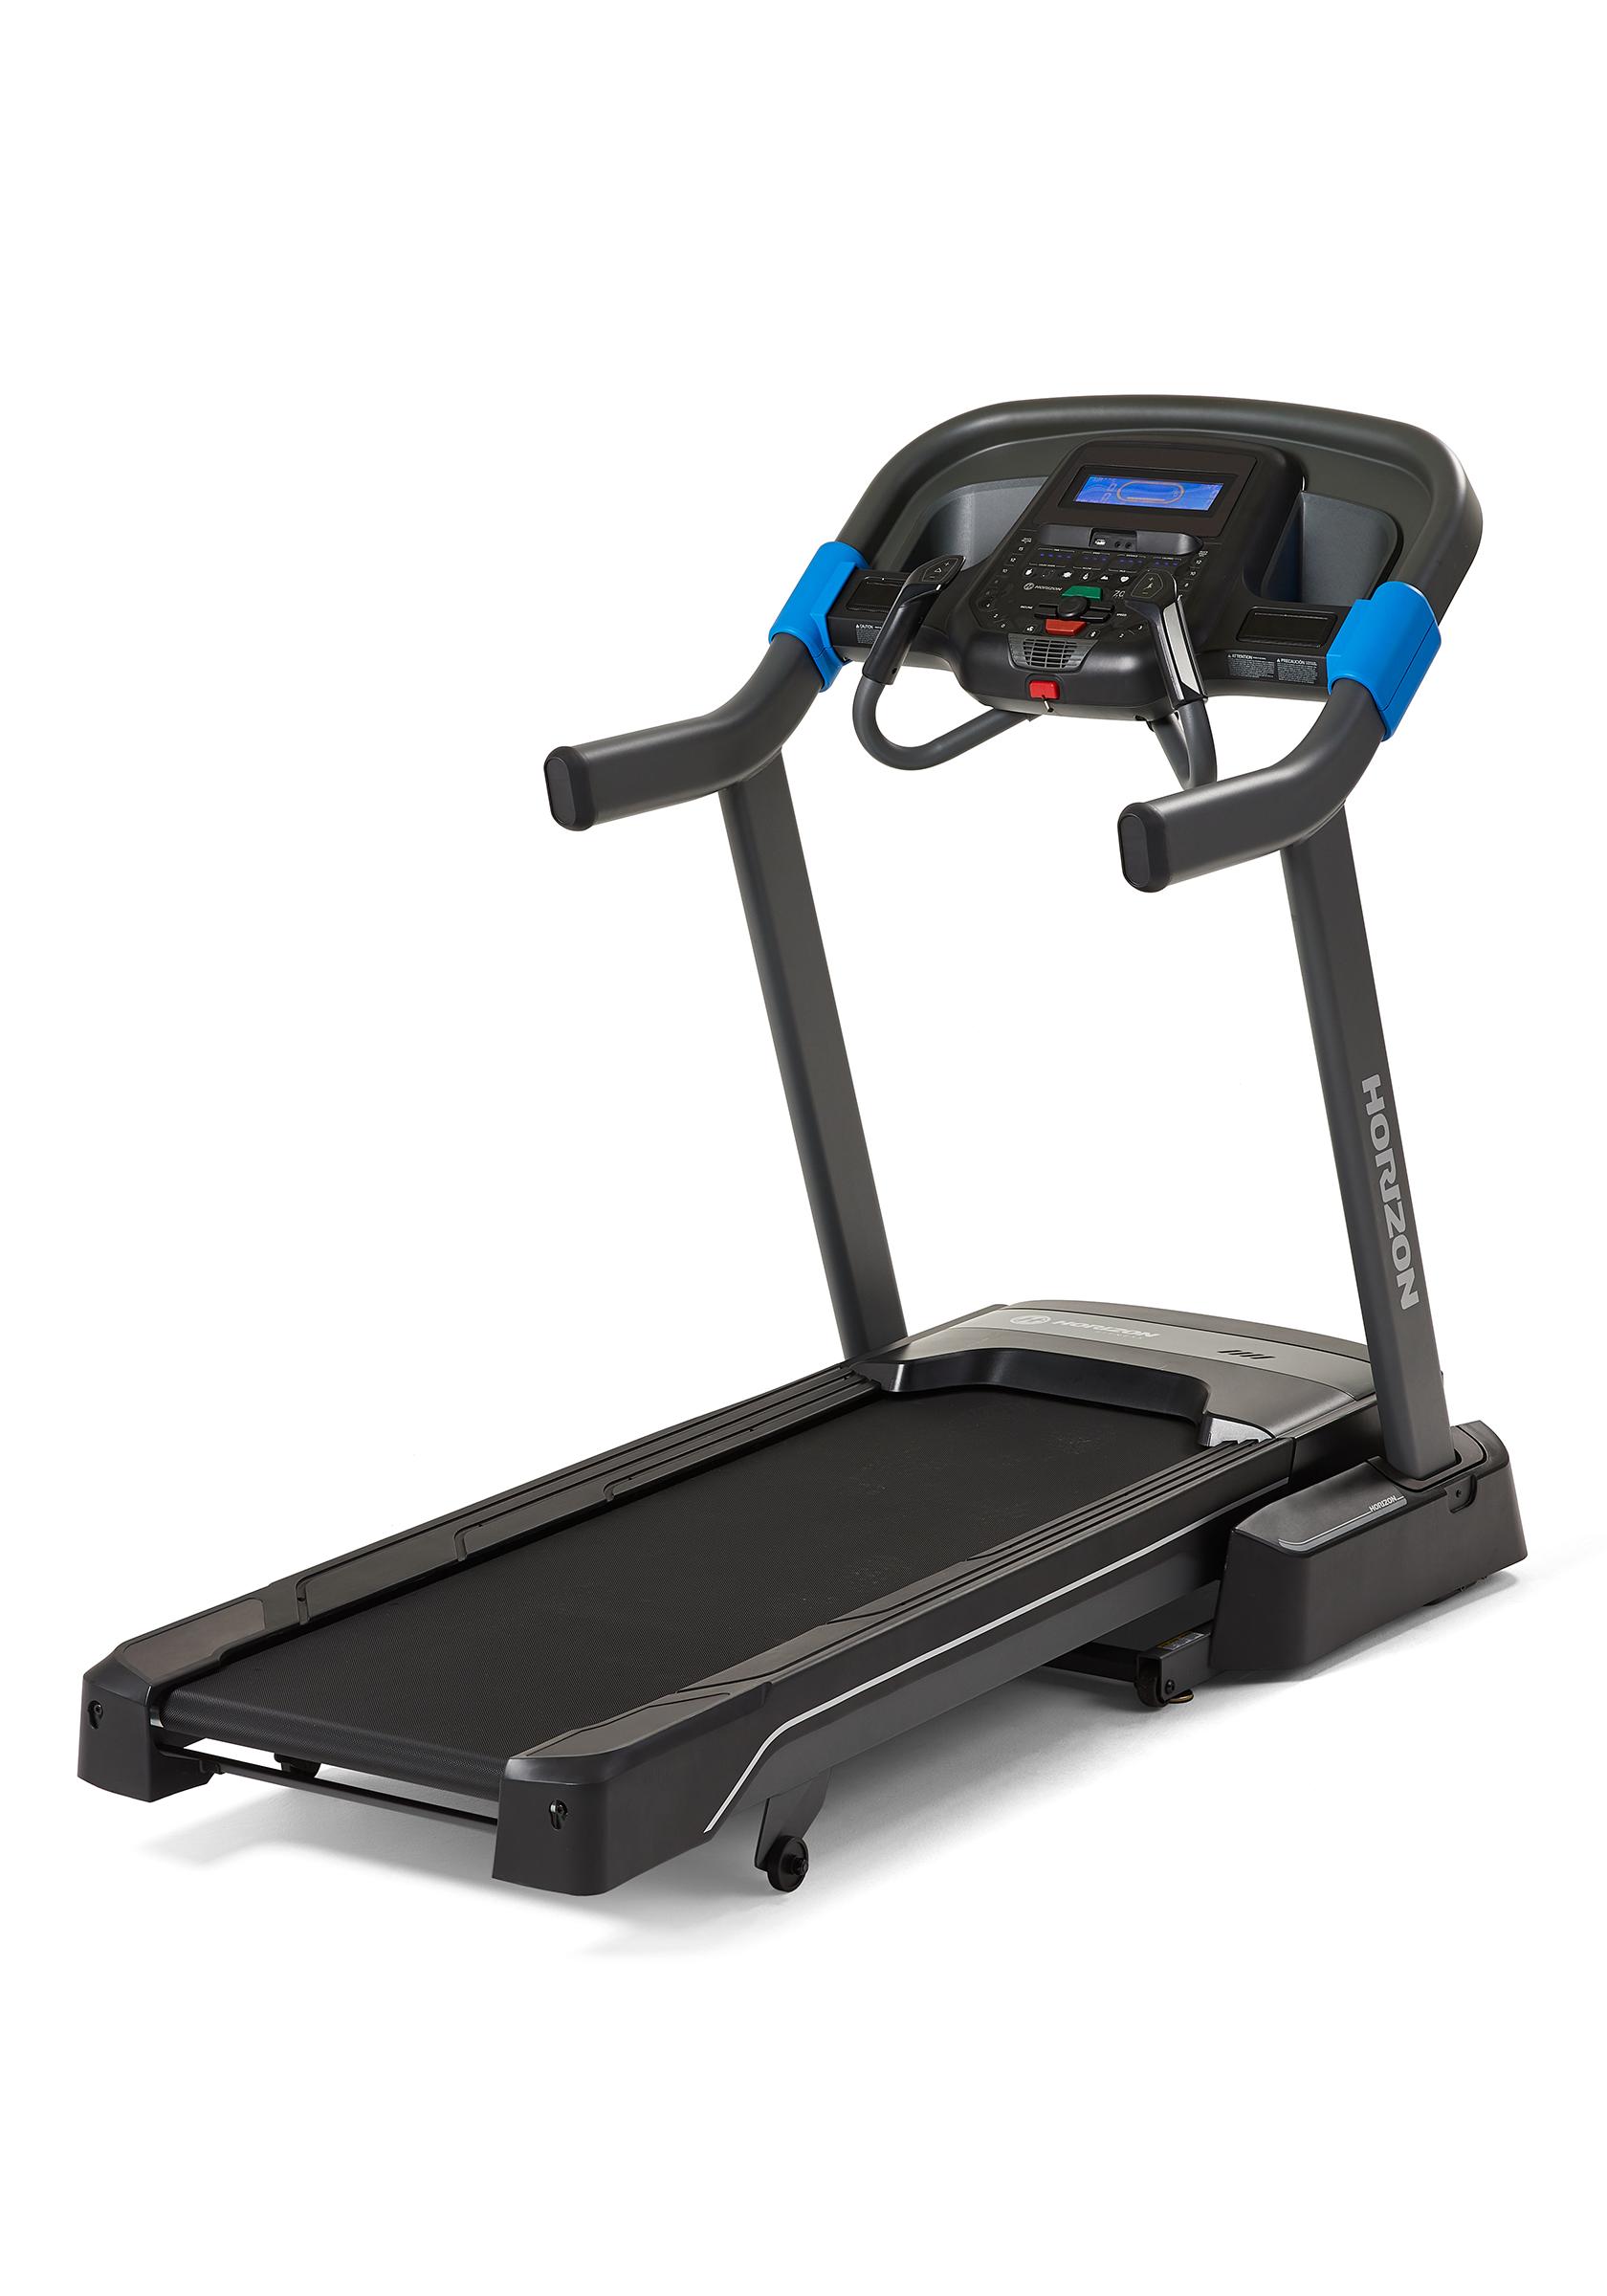 Horizon Treadmill 7.0A - Black/blue